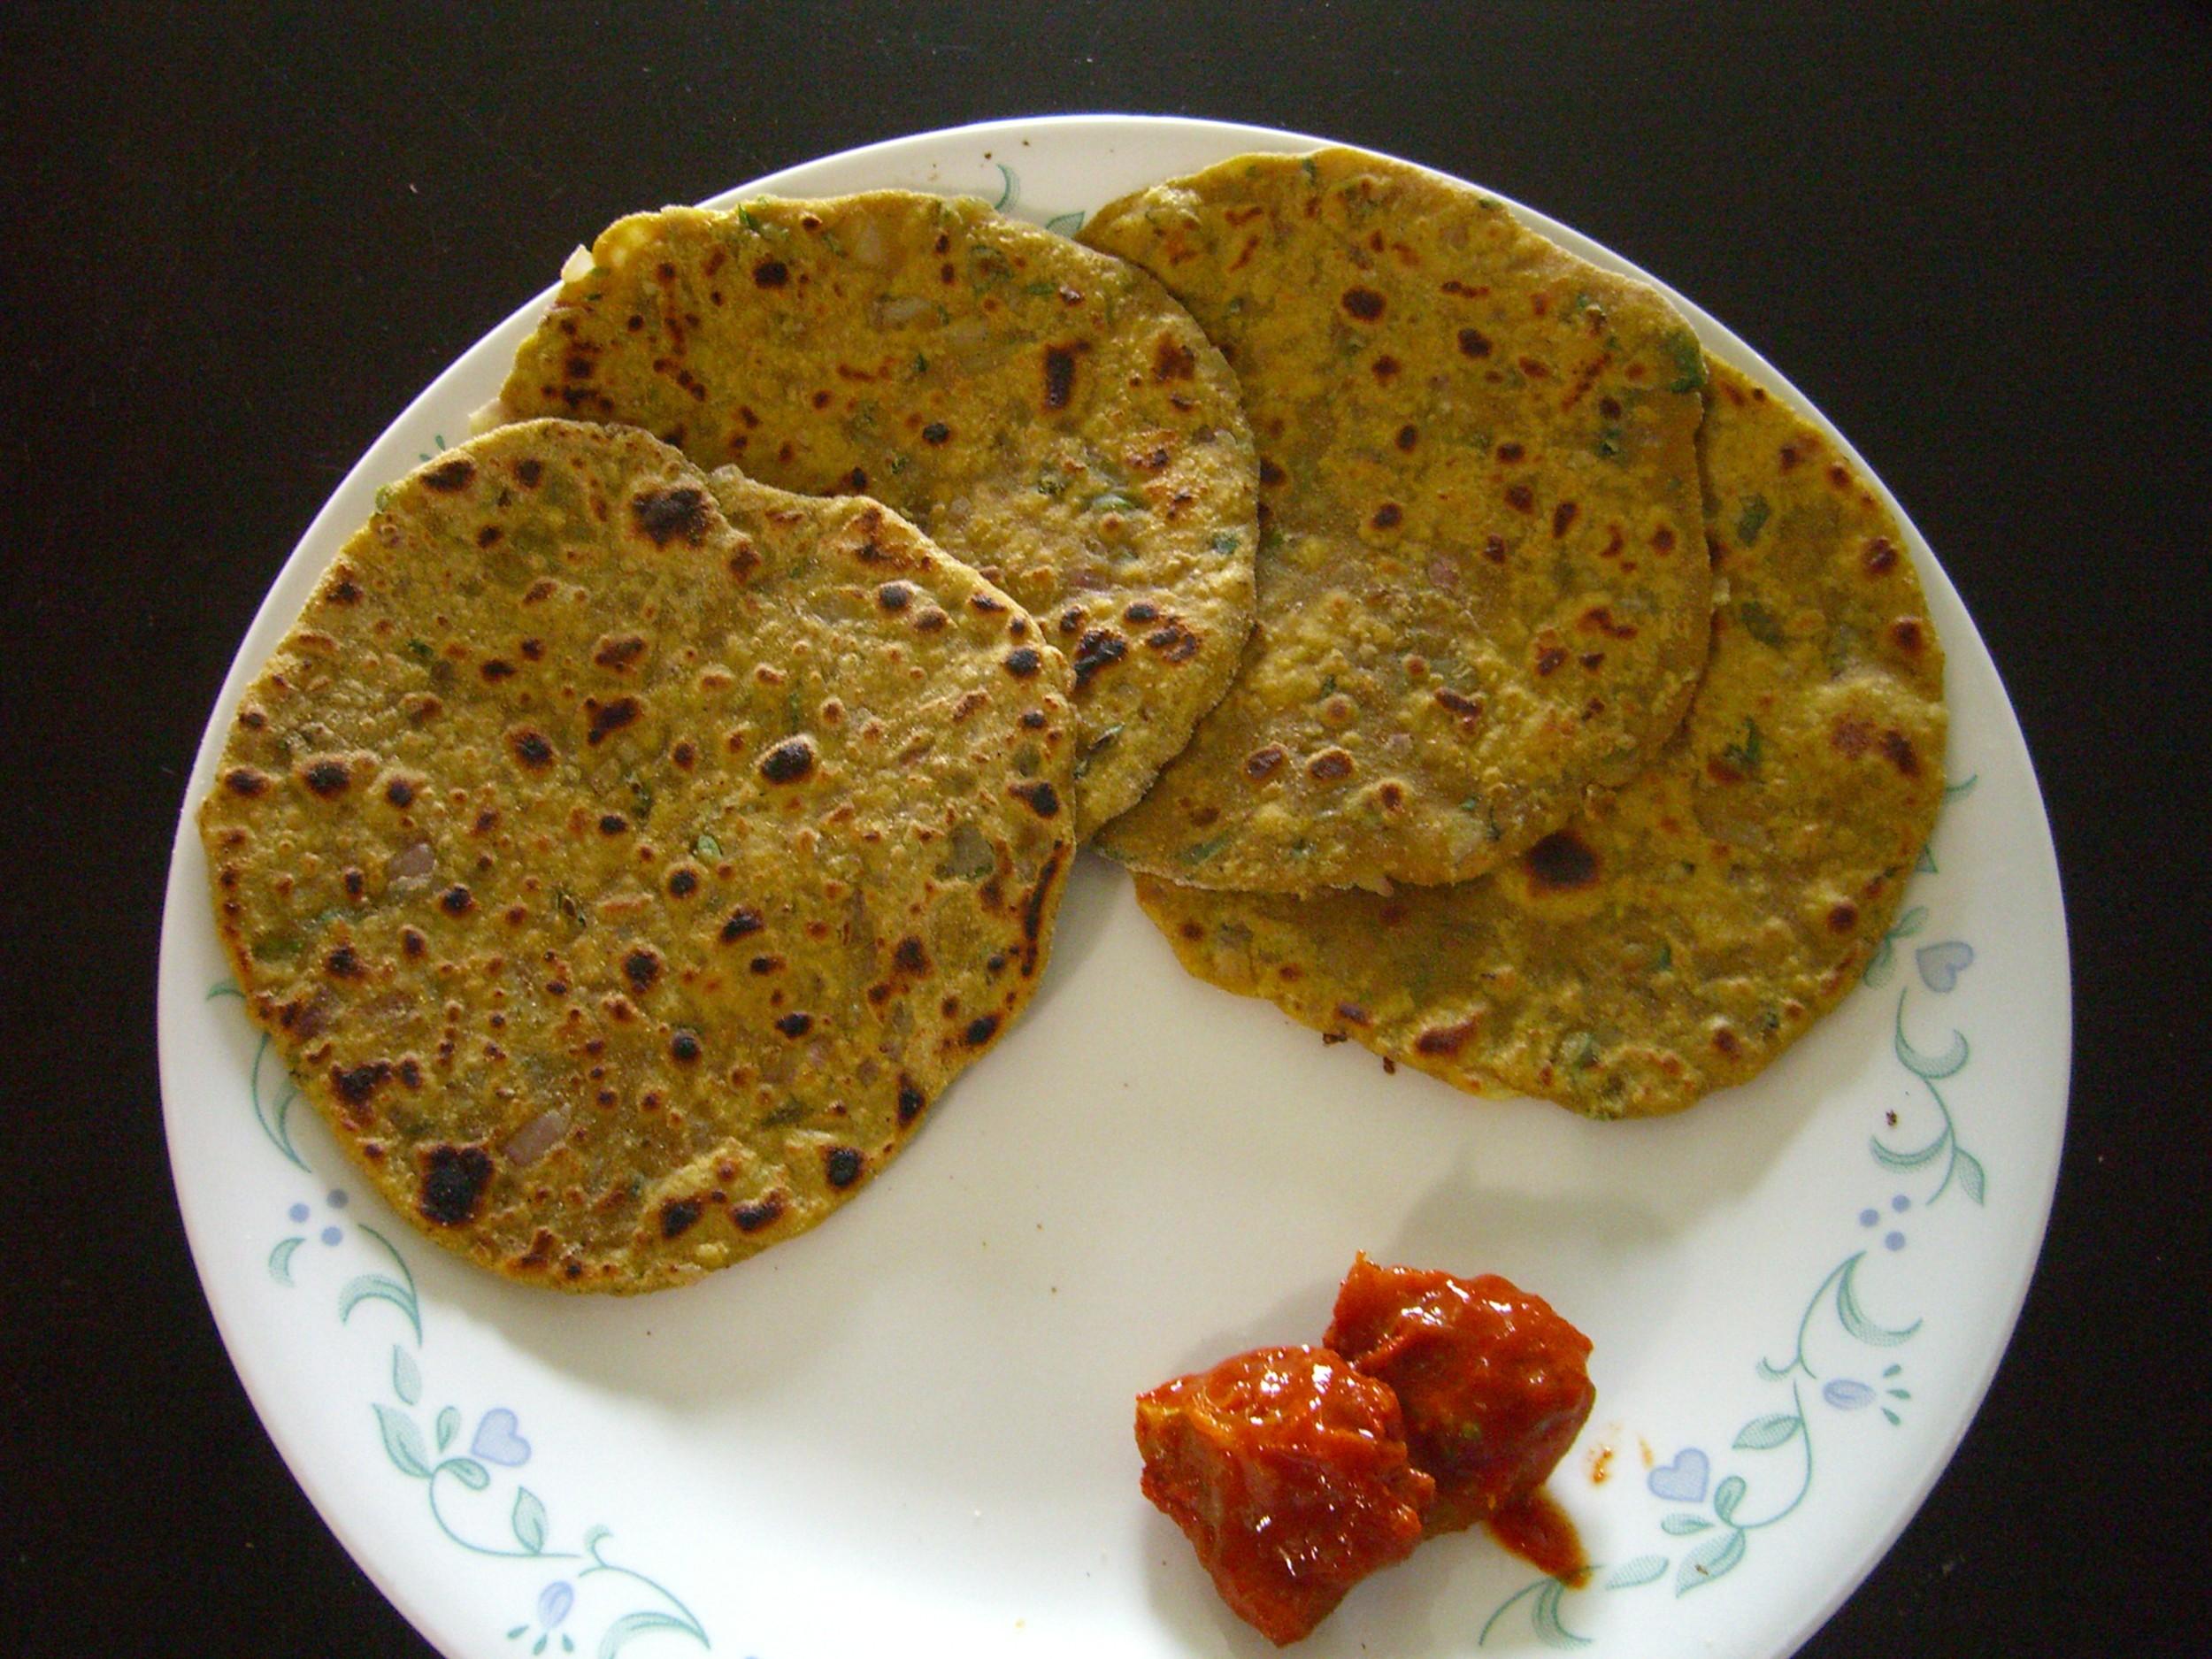 Missi roti recipe by sarita bhandarkar for Roti food bar